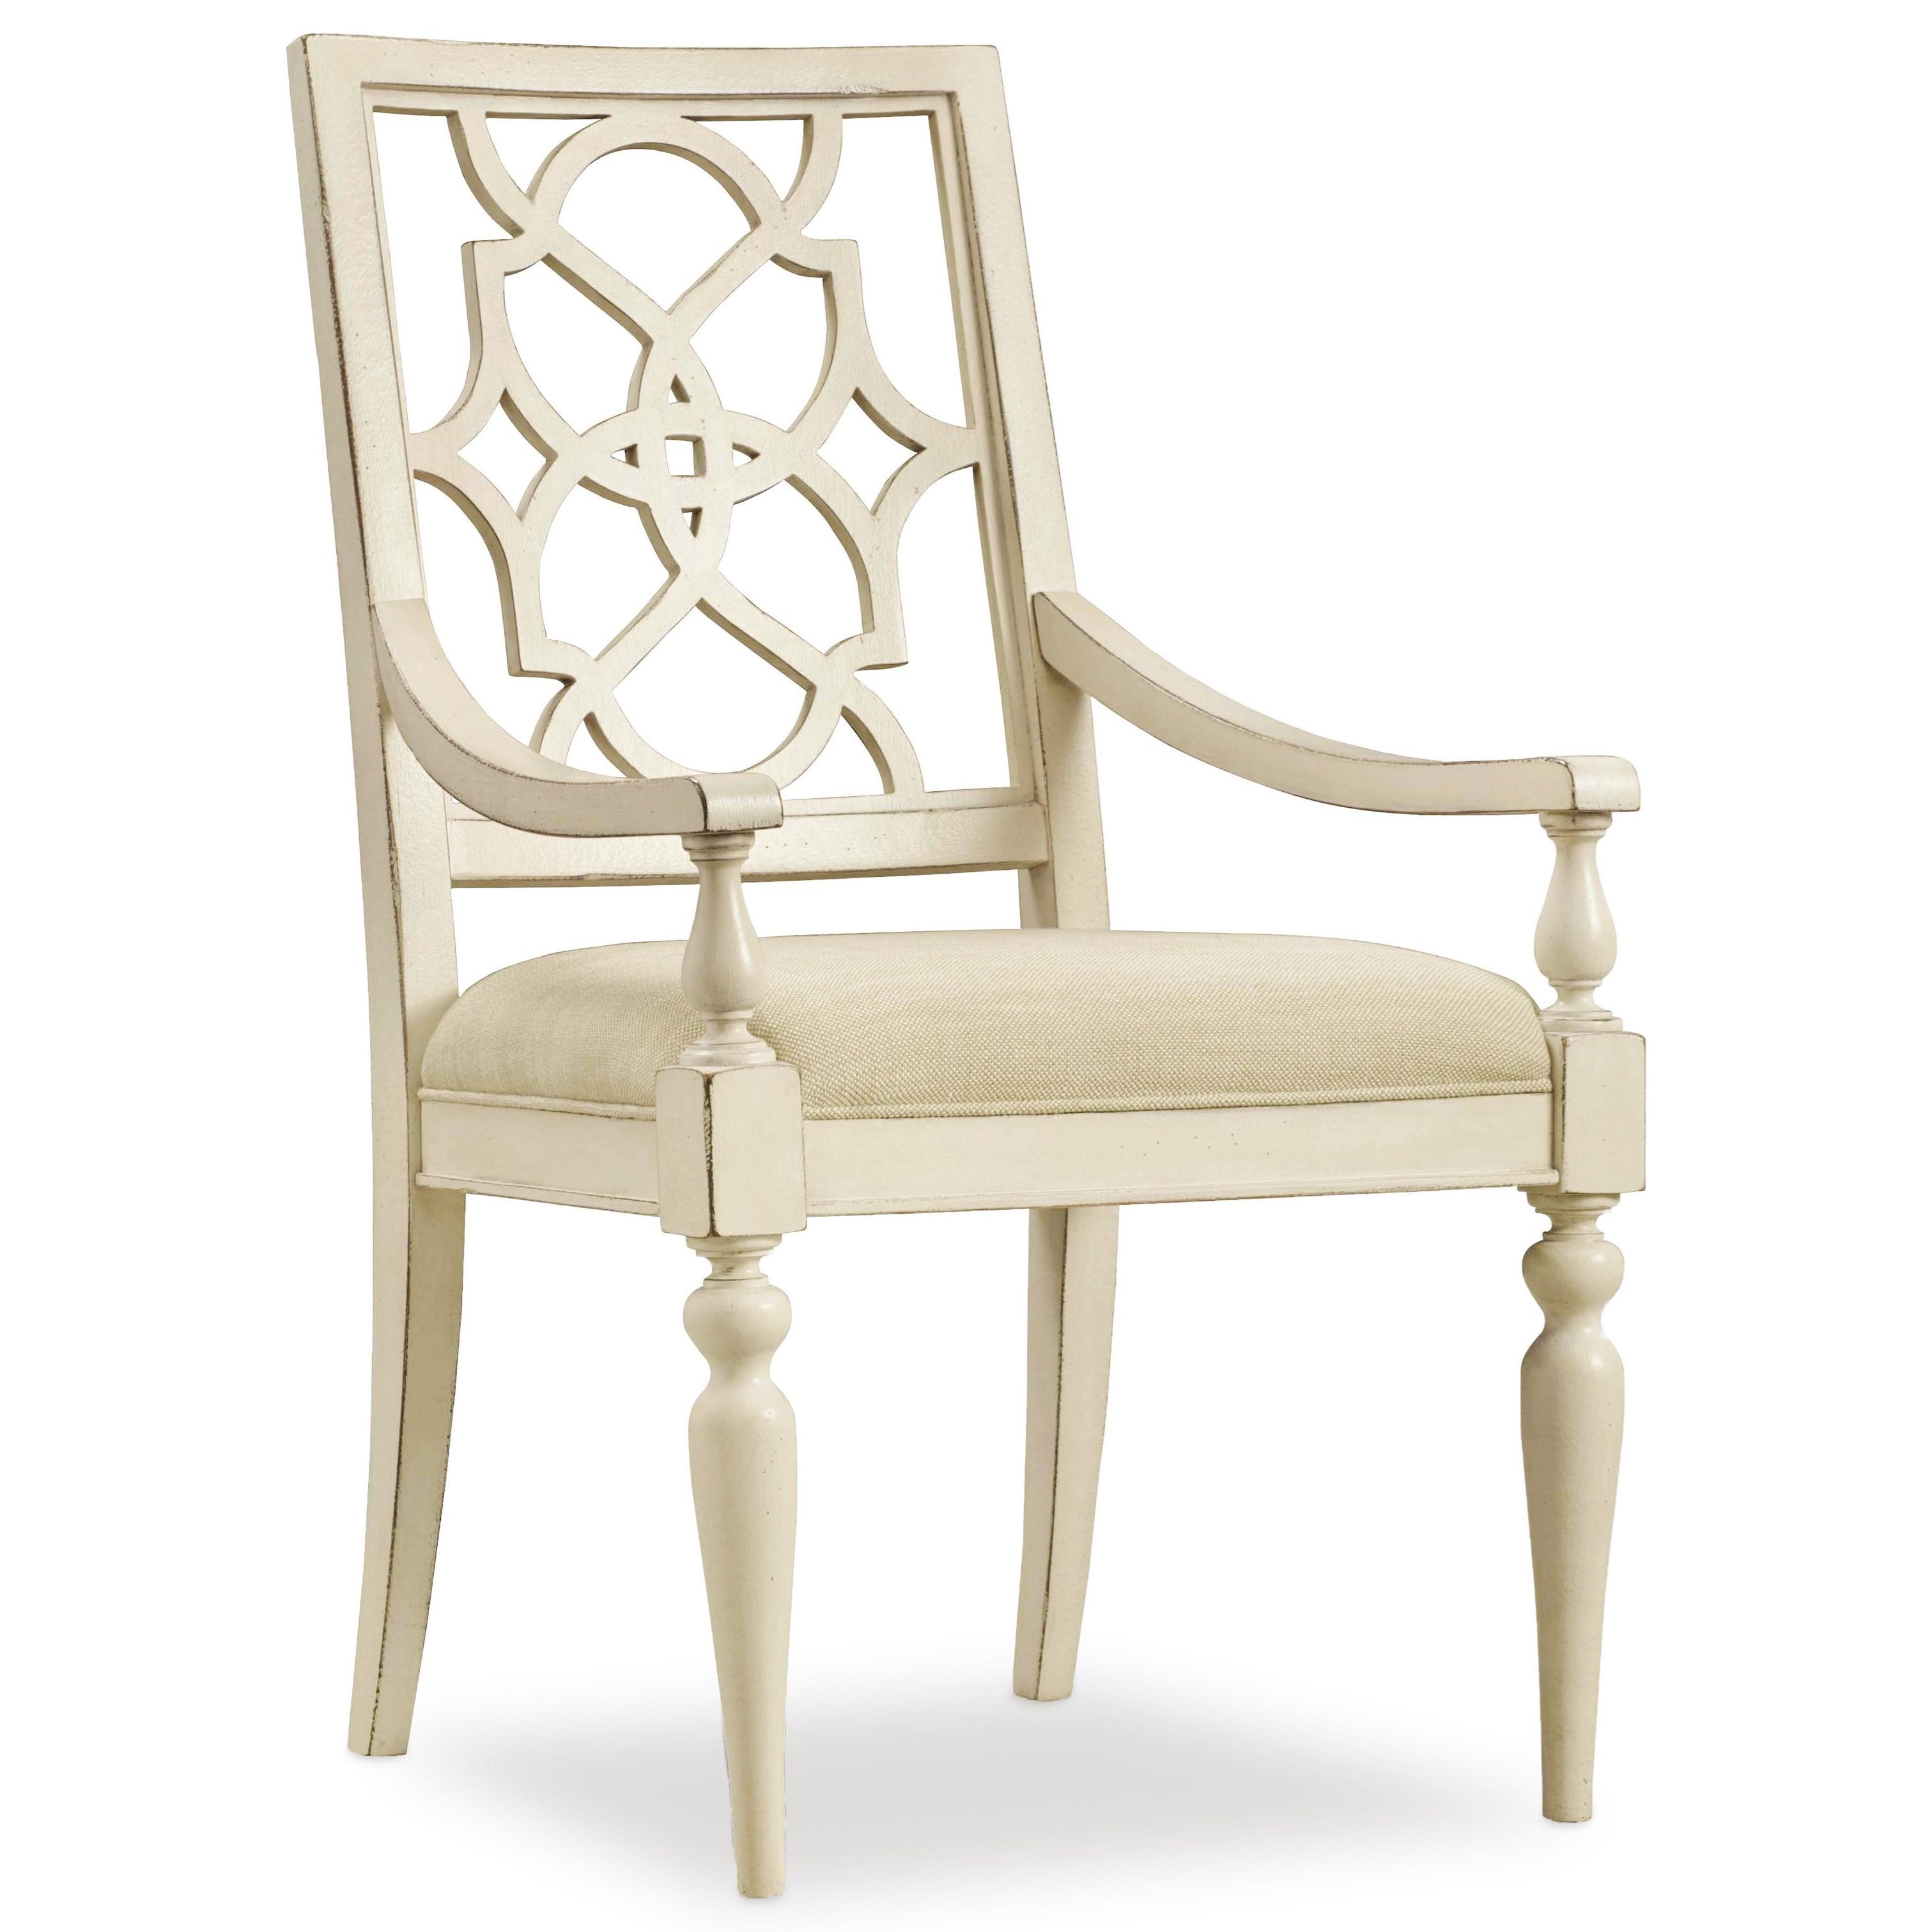 Hooker Furniture Sandcastle Fretback Arm Chair